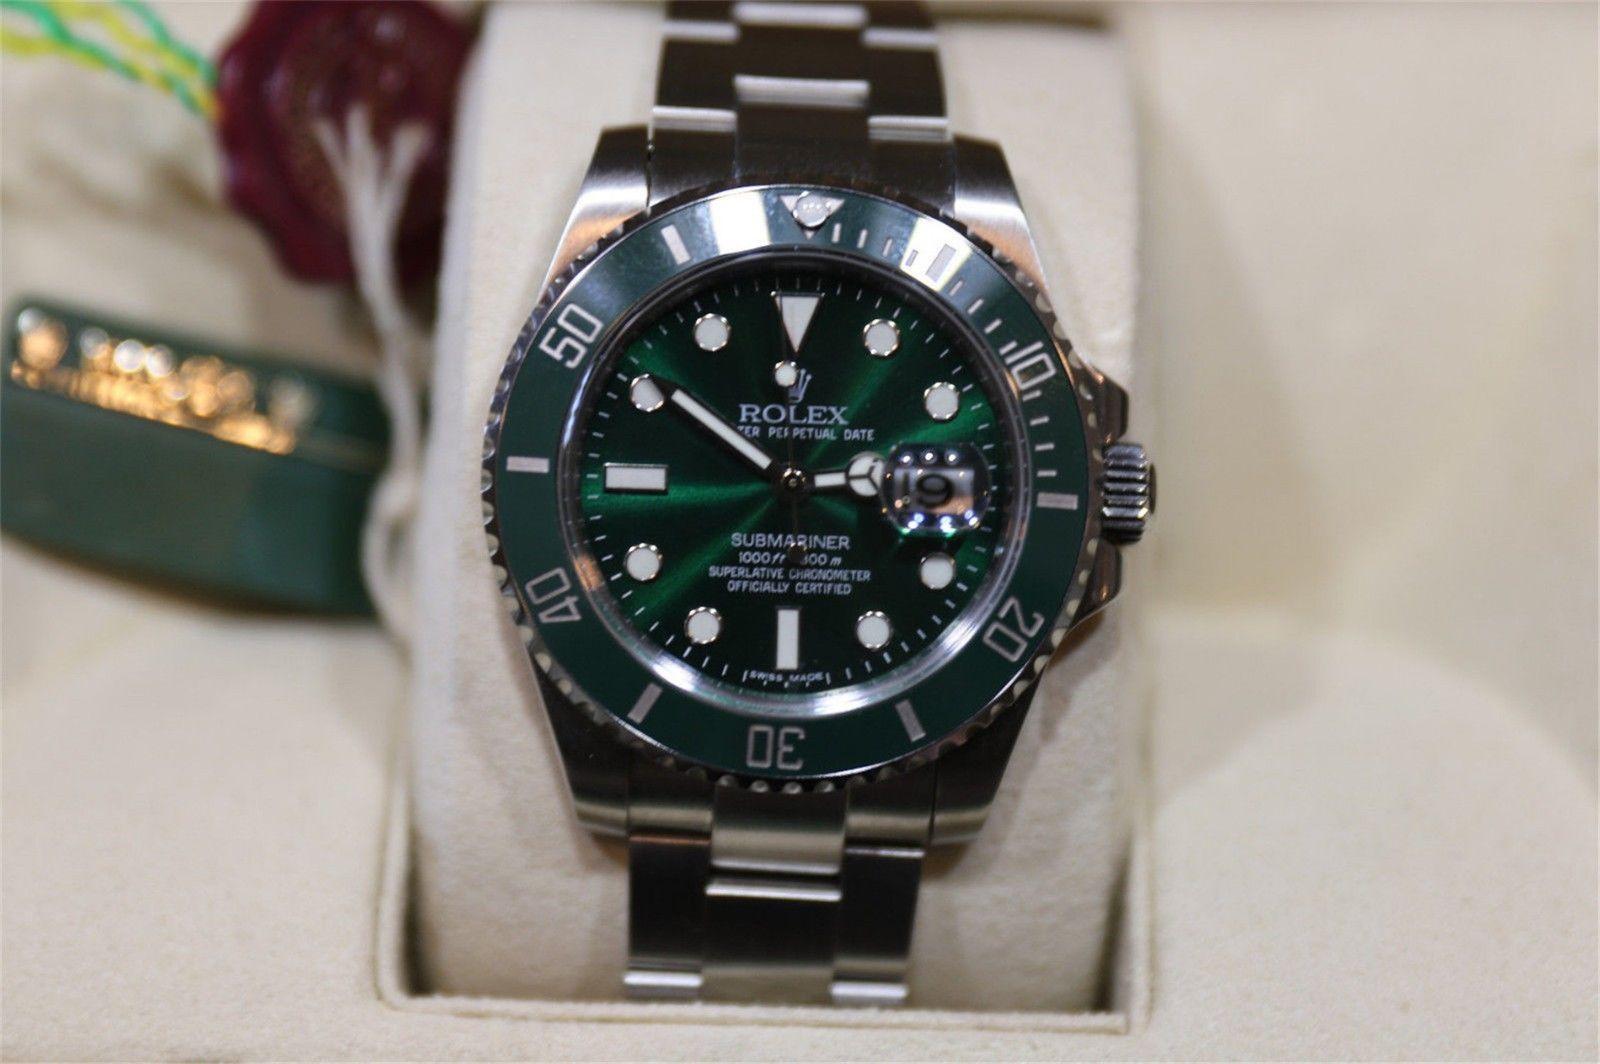 #Trending - Rolex Submariner CUSTOM Green Dial Stainless Steel Mens Dive Watch https://t.co/yKGHKhDBty #Ebay https://t.co/2k5IcvVuQx